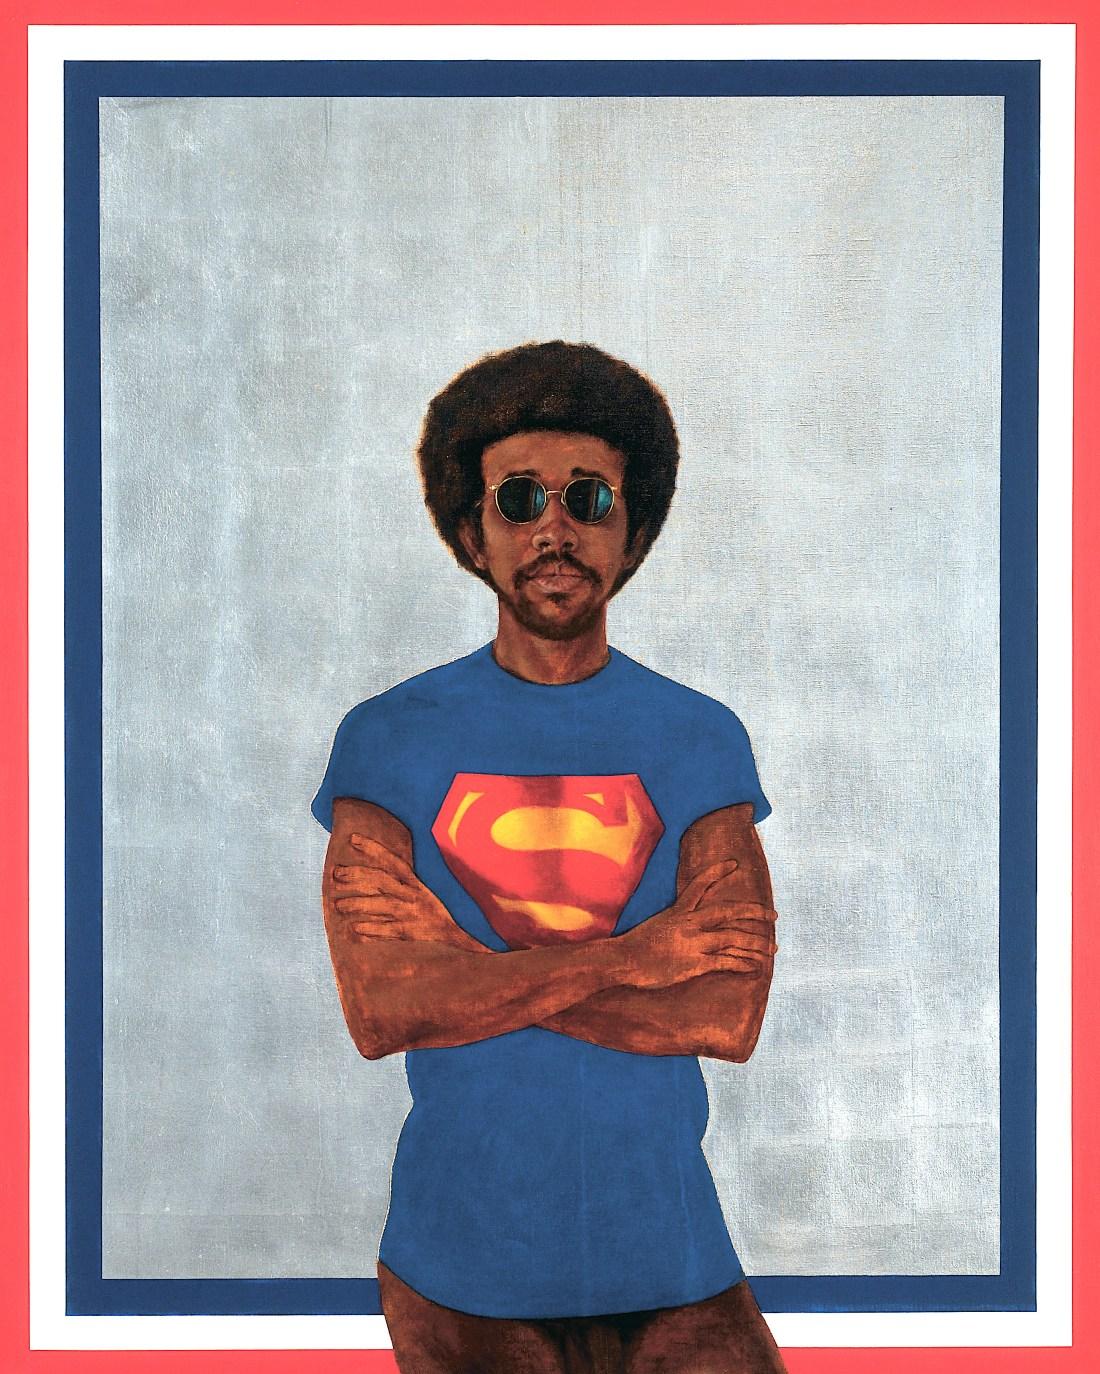 Barkley L. Hendricks, Benny Andrews, Carolyn Mims, African American Art, Black Art, African American History, Black History, African American News, KOLUMN Magazine, KOLUMN